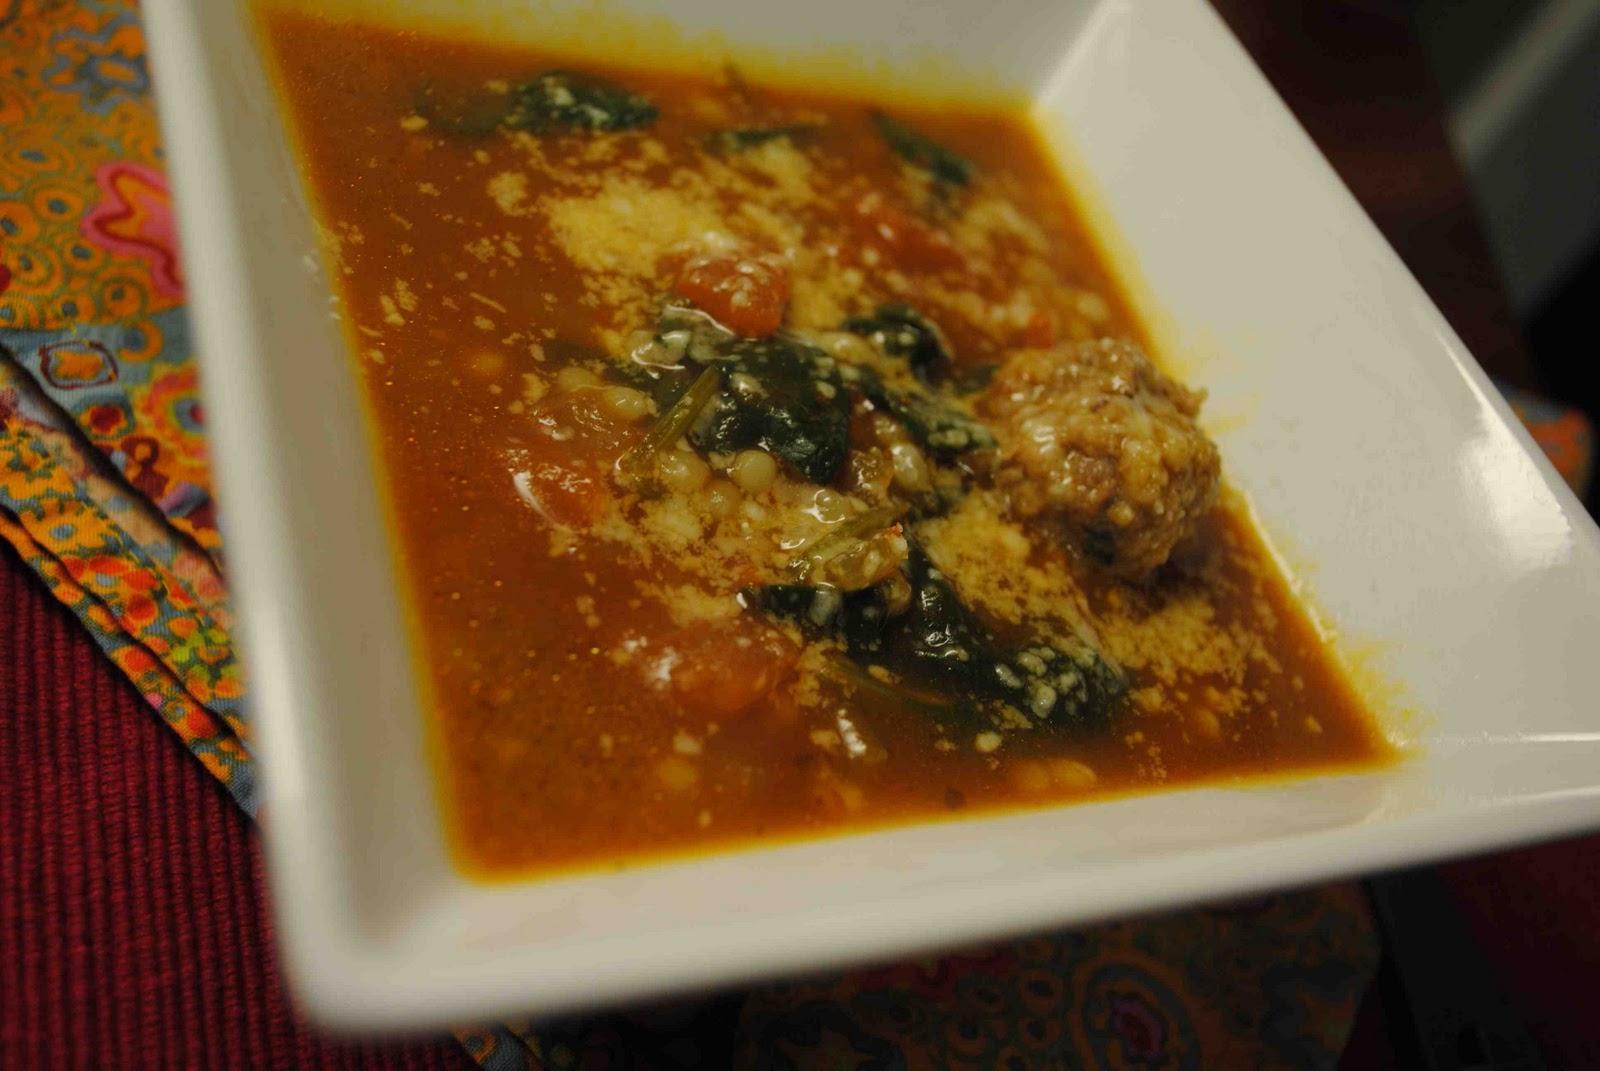 italian wedding soup clipart